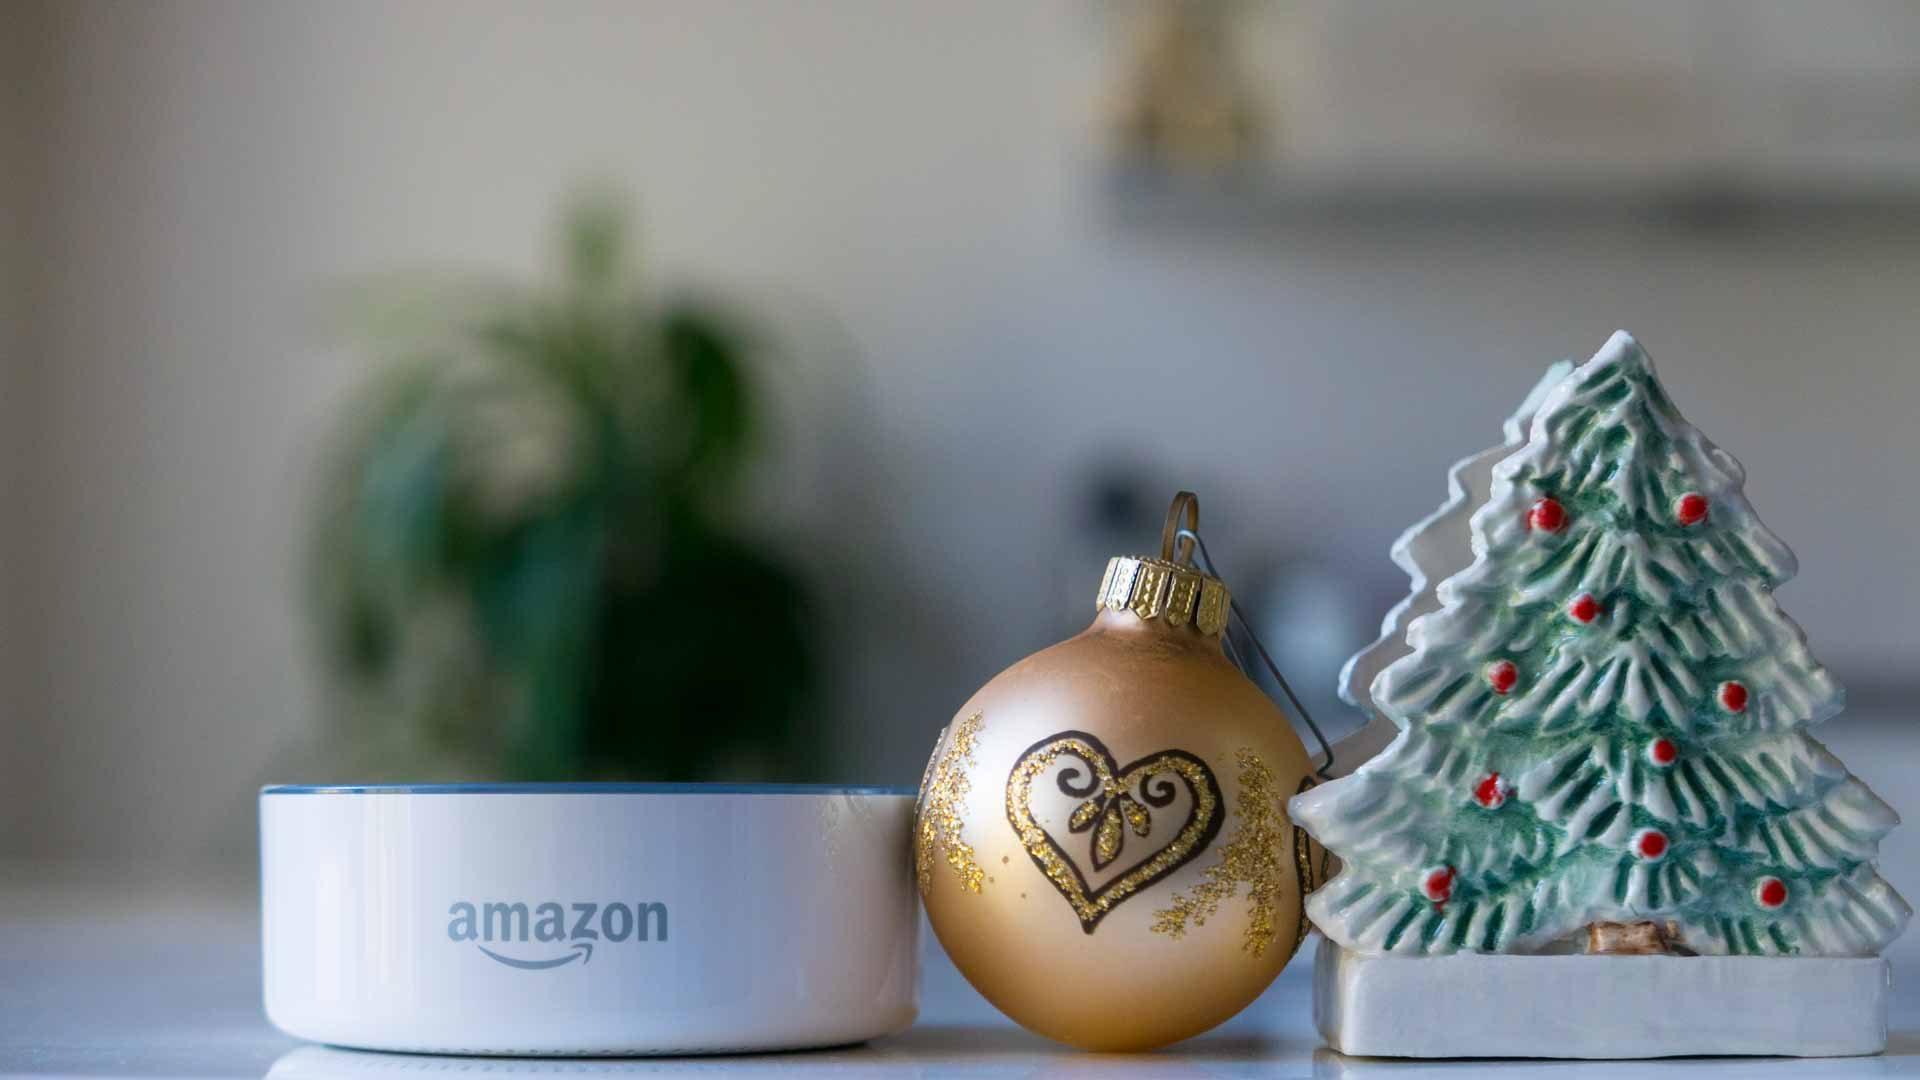 Besonders beliebte Weihnachtsgeschenke 2017: Smart-Speakers!